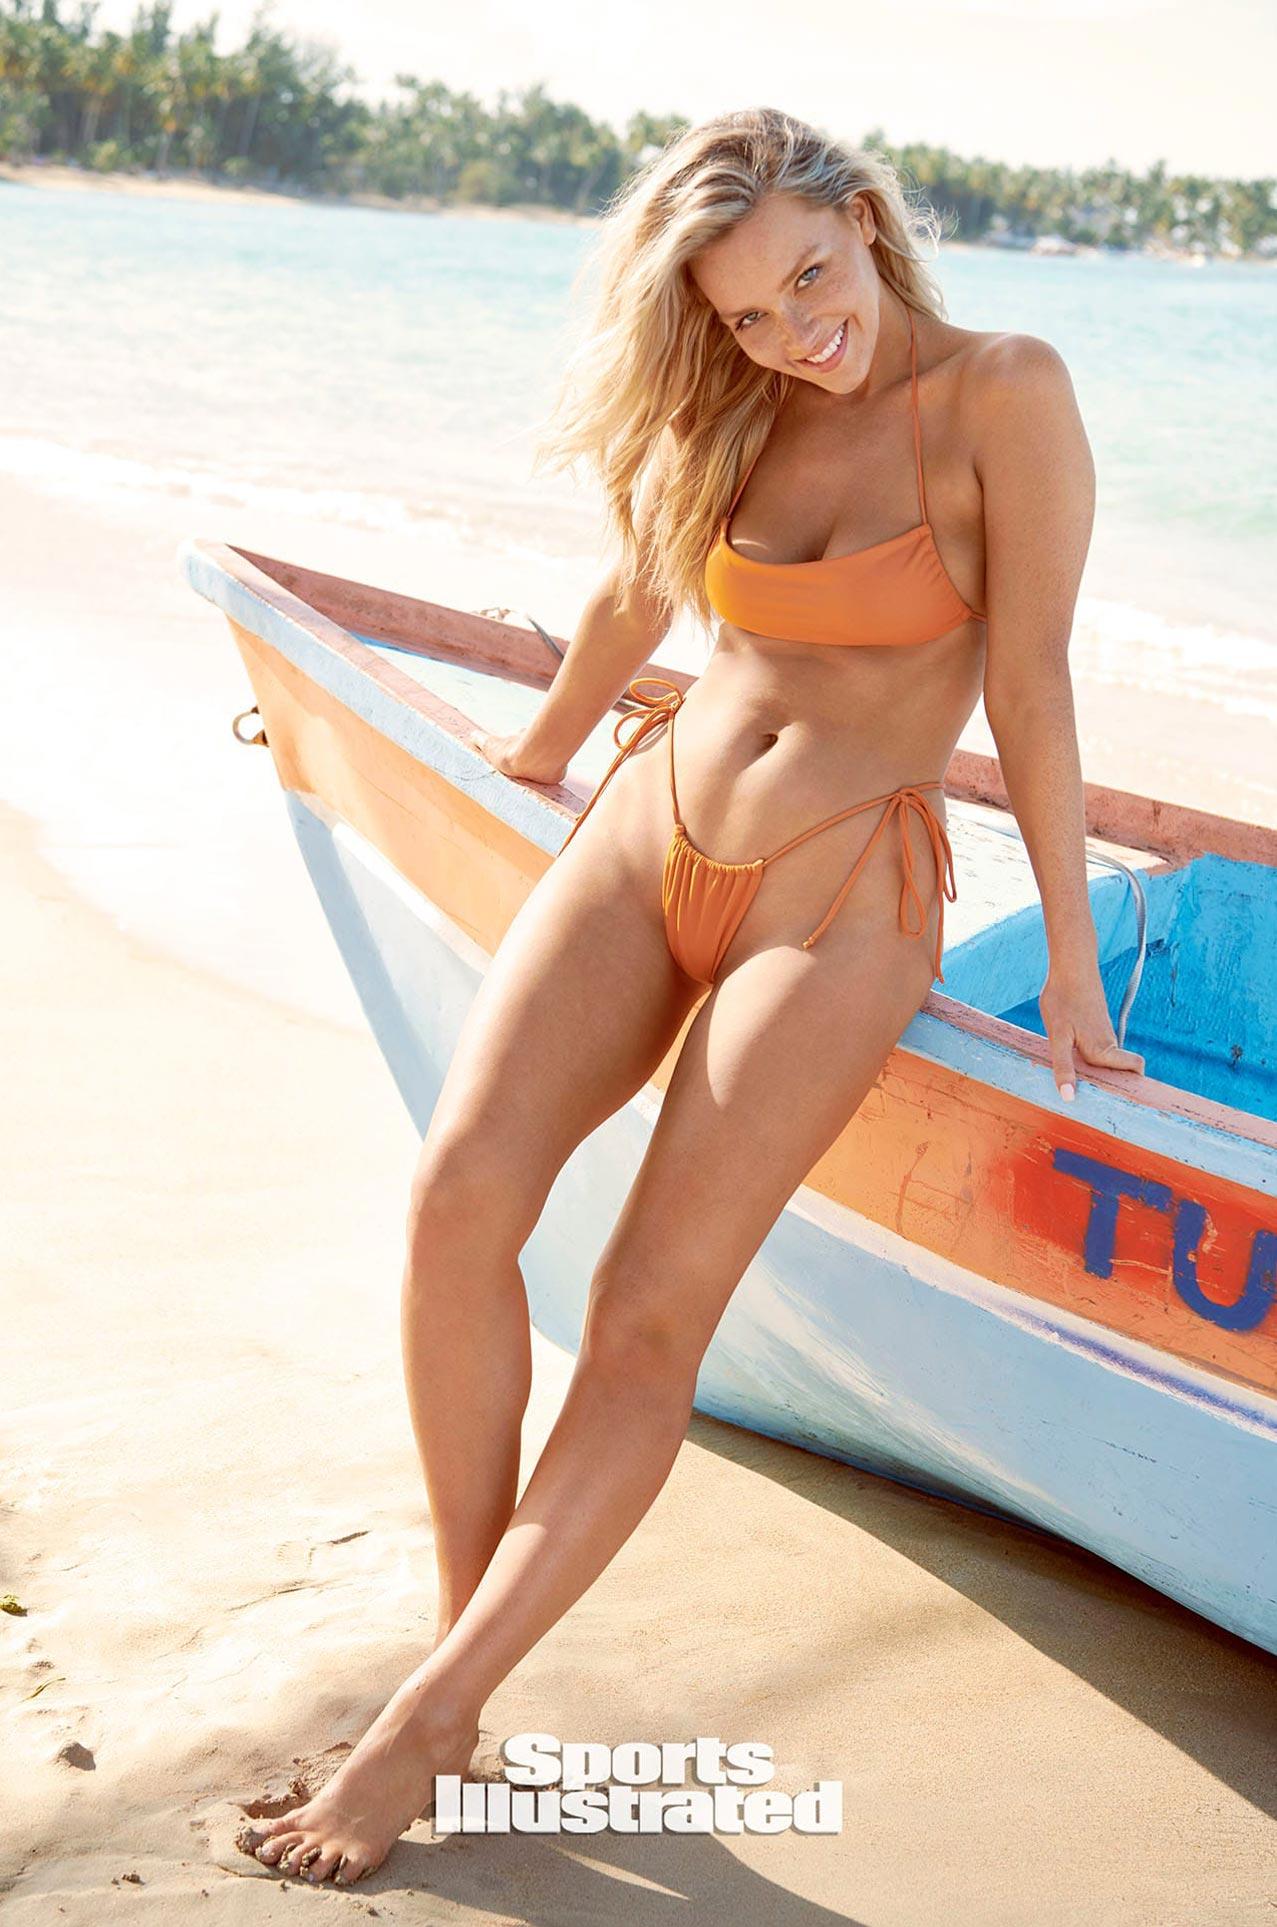 Камилла Костек в каталоге купальников Sports Illustrated Swimsuit 2020 / фото 22